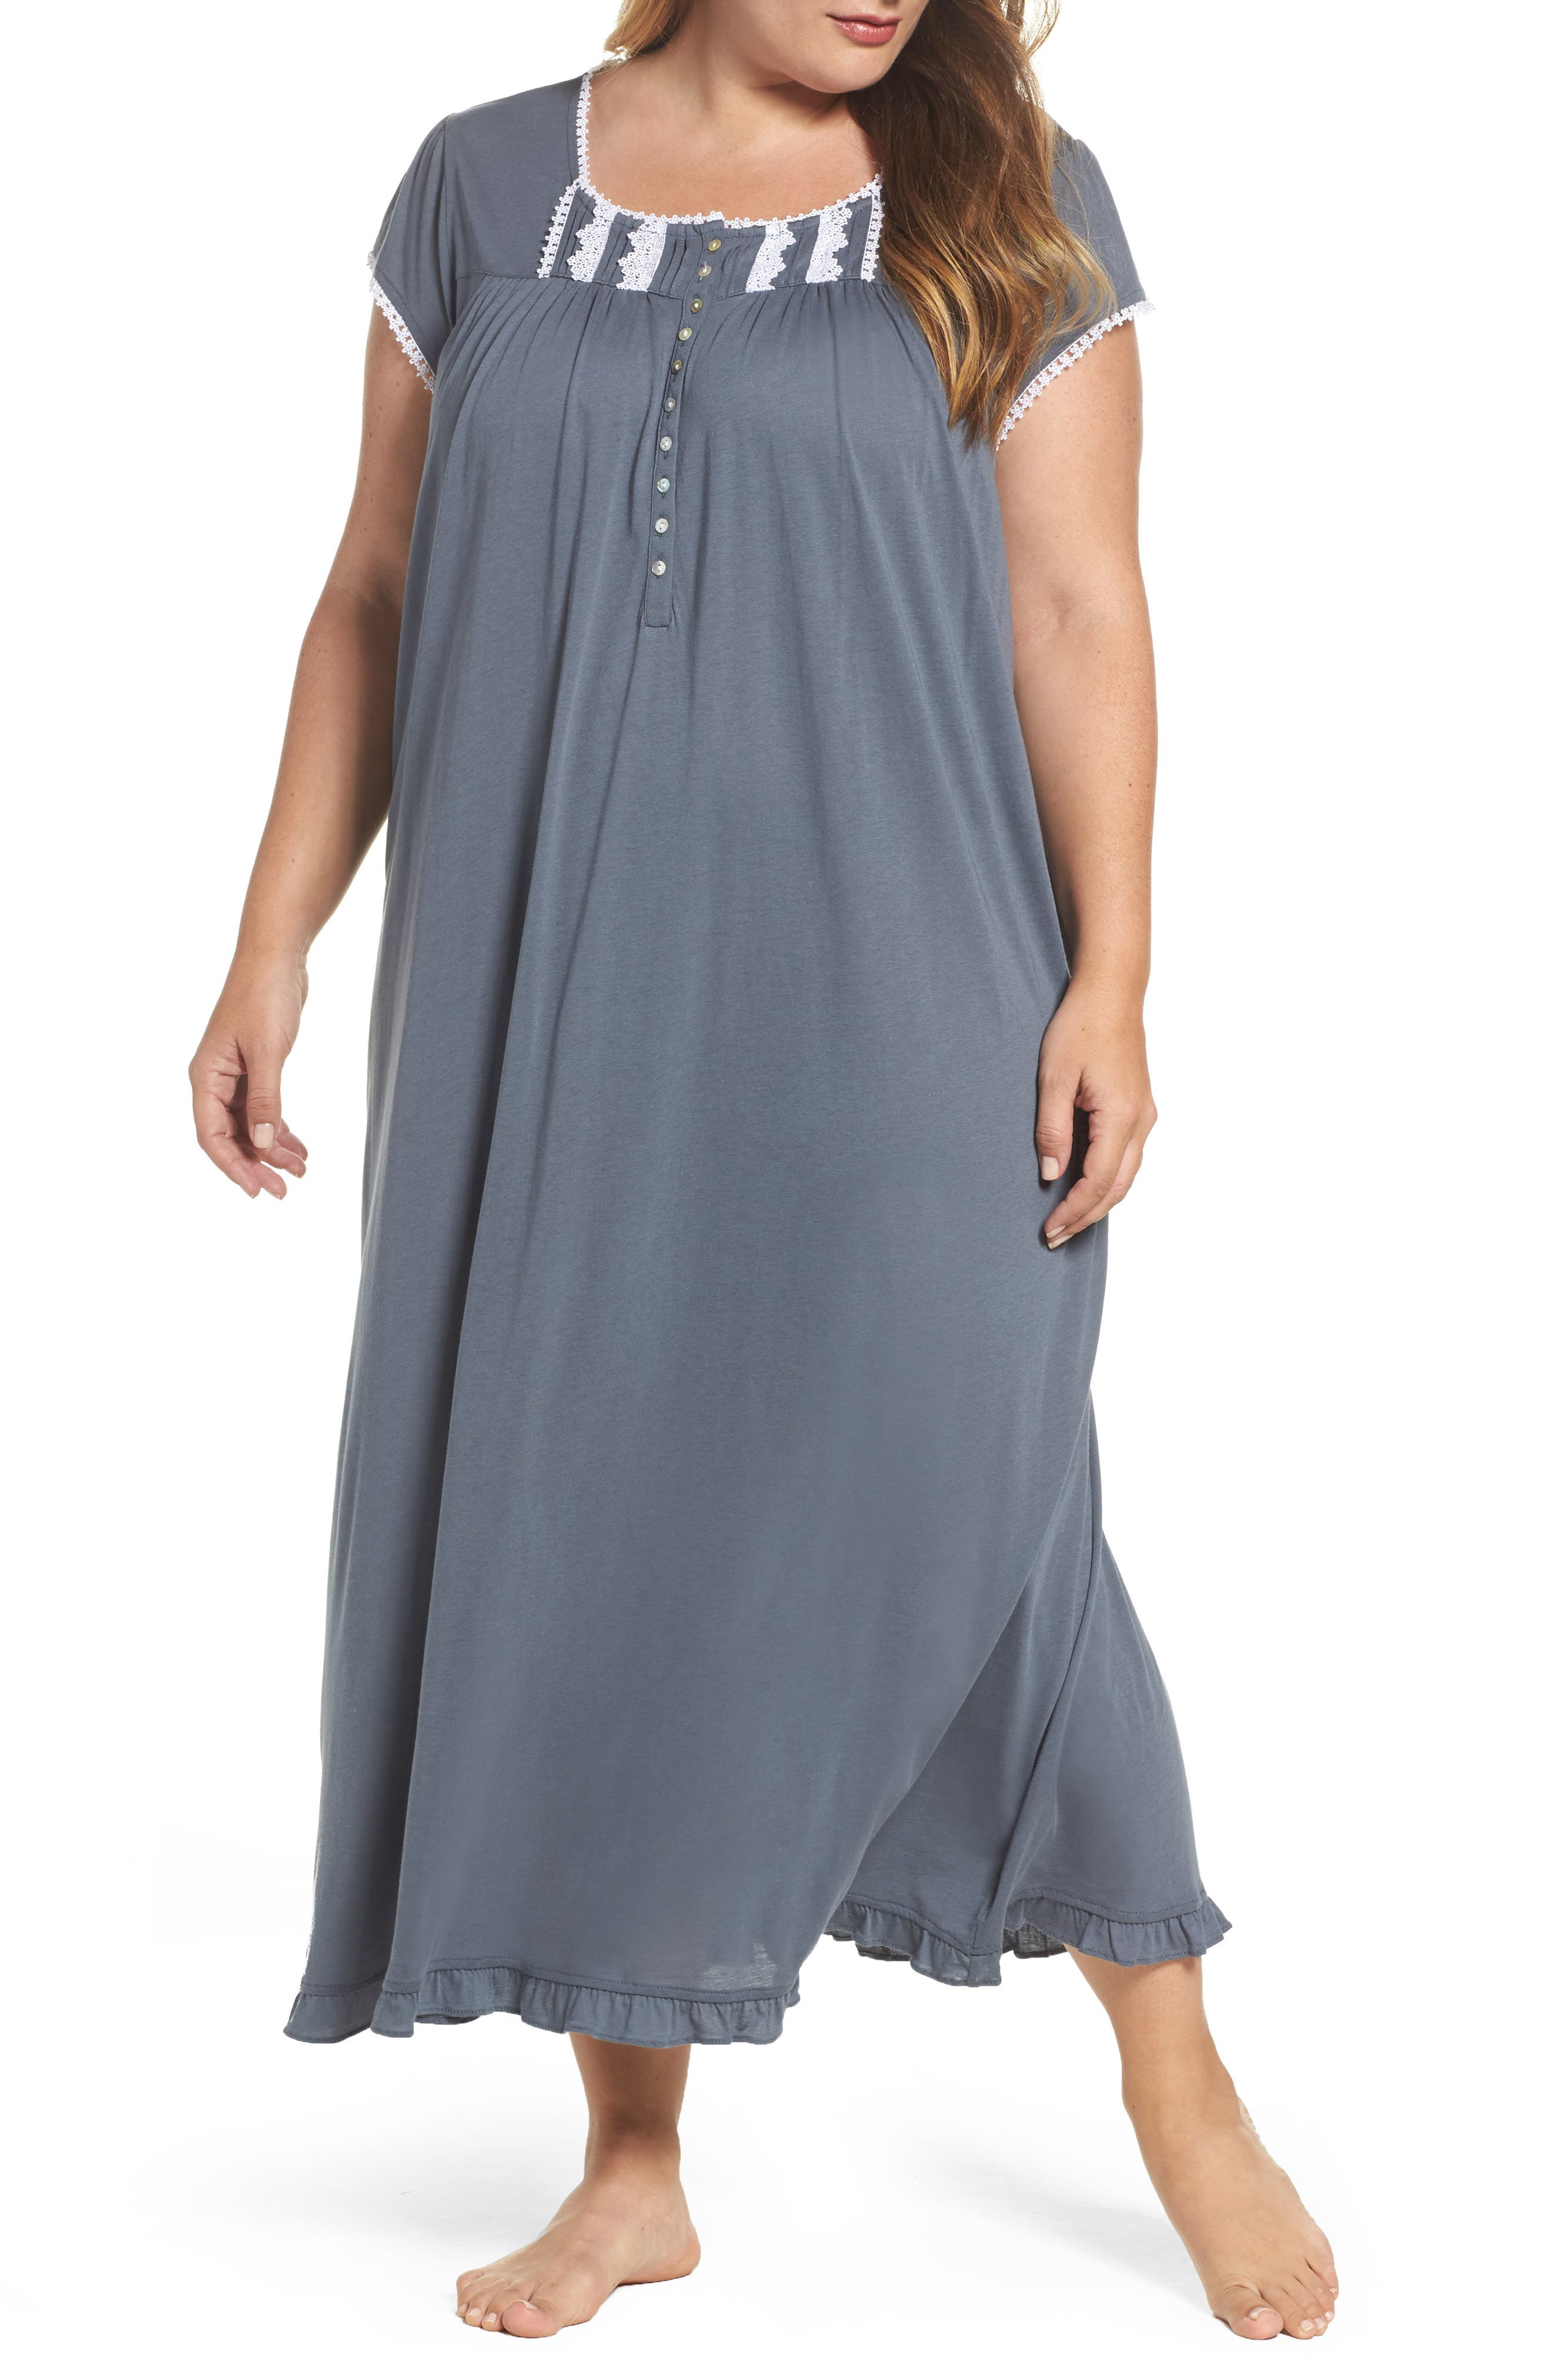 Cotton & Modal Long Nightgown,                             Main thumbnail 1, color,                             Grey